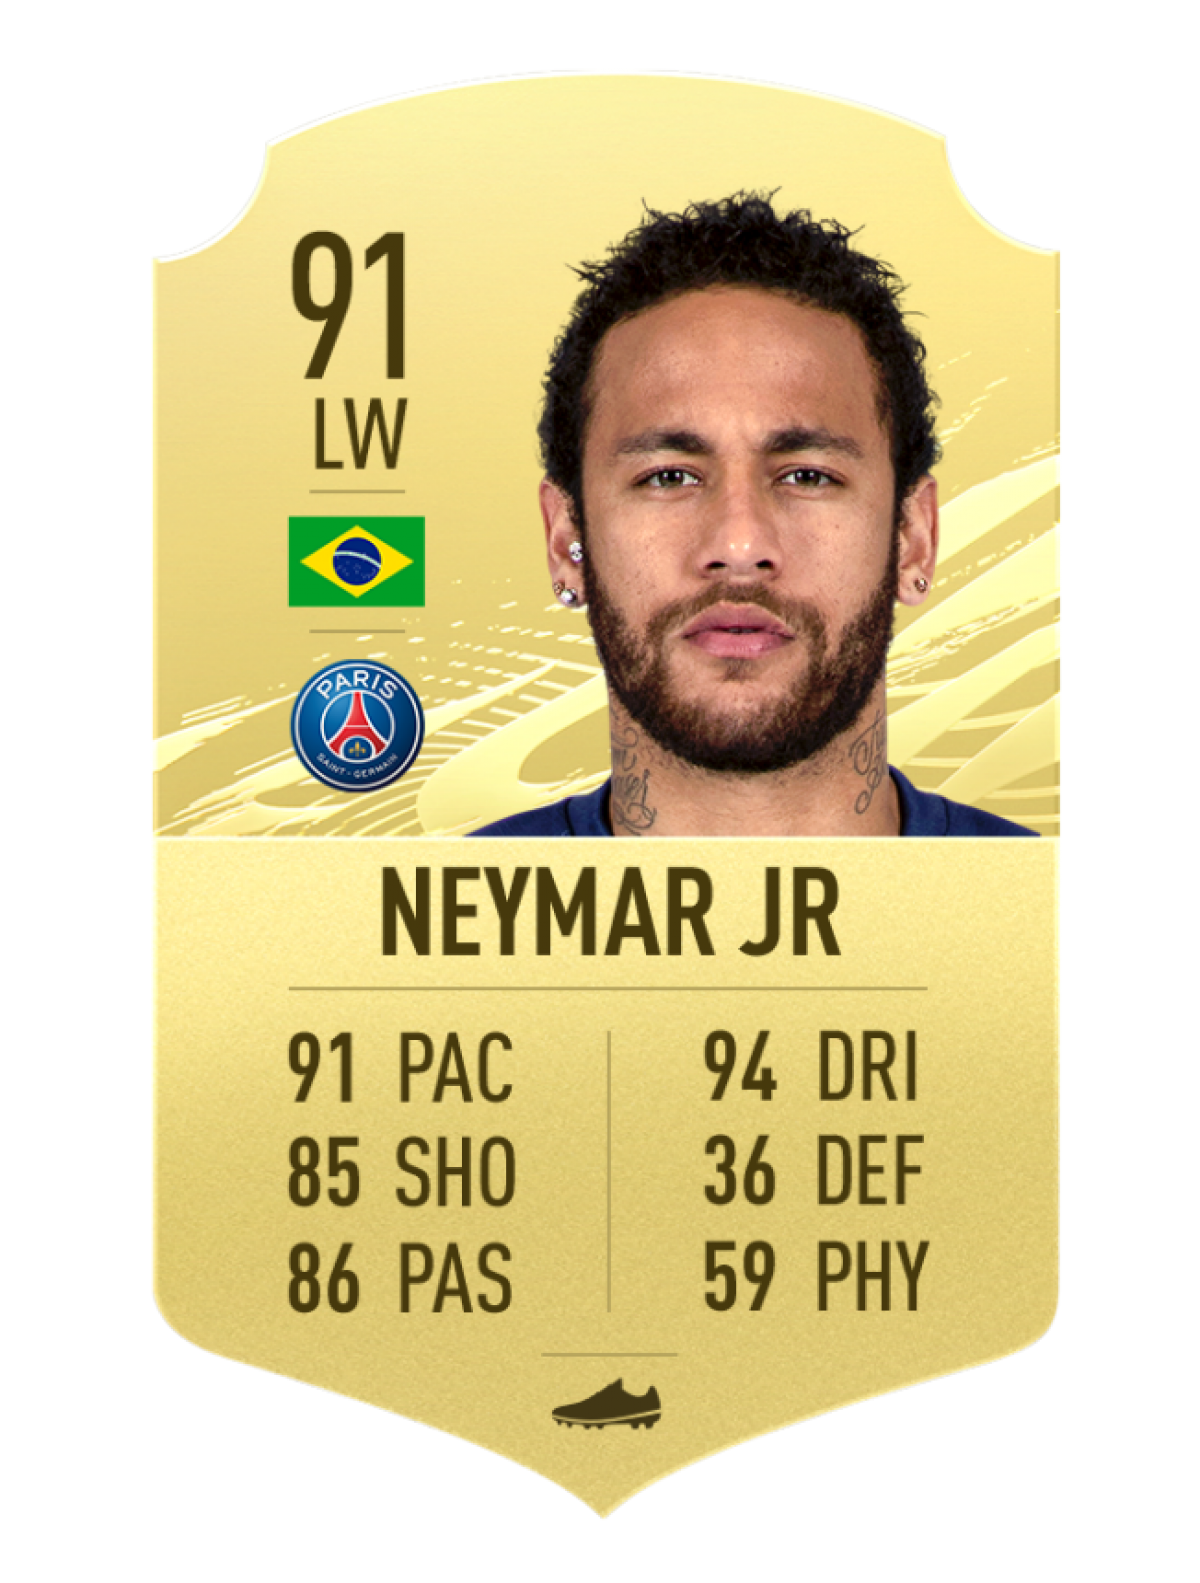 2. Neymar Jr - Paris Saint-Germain | Chỉ số rê bóng 94